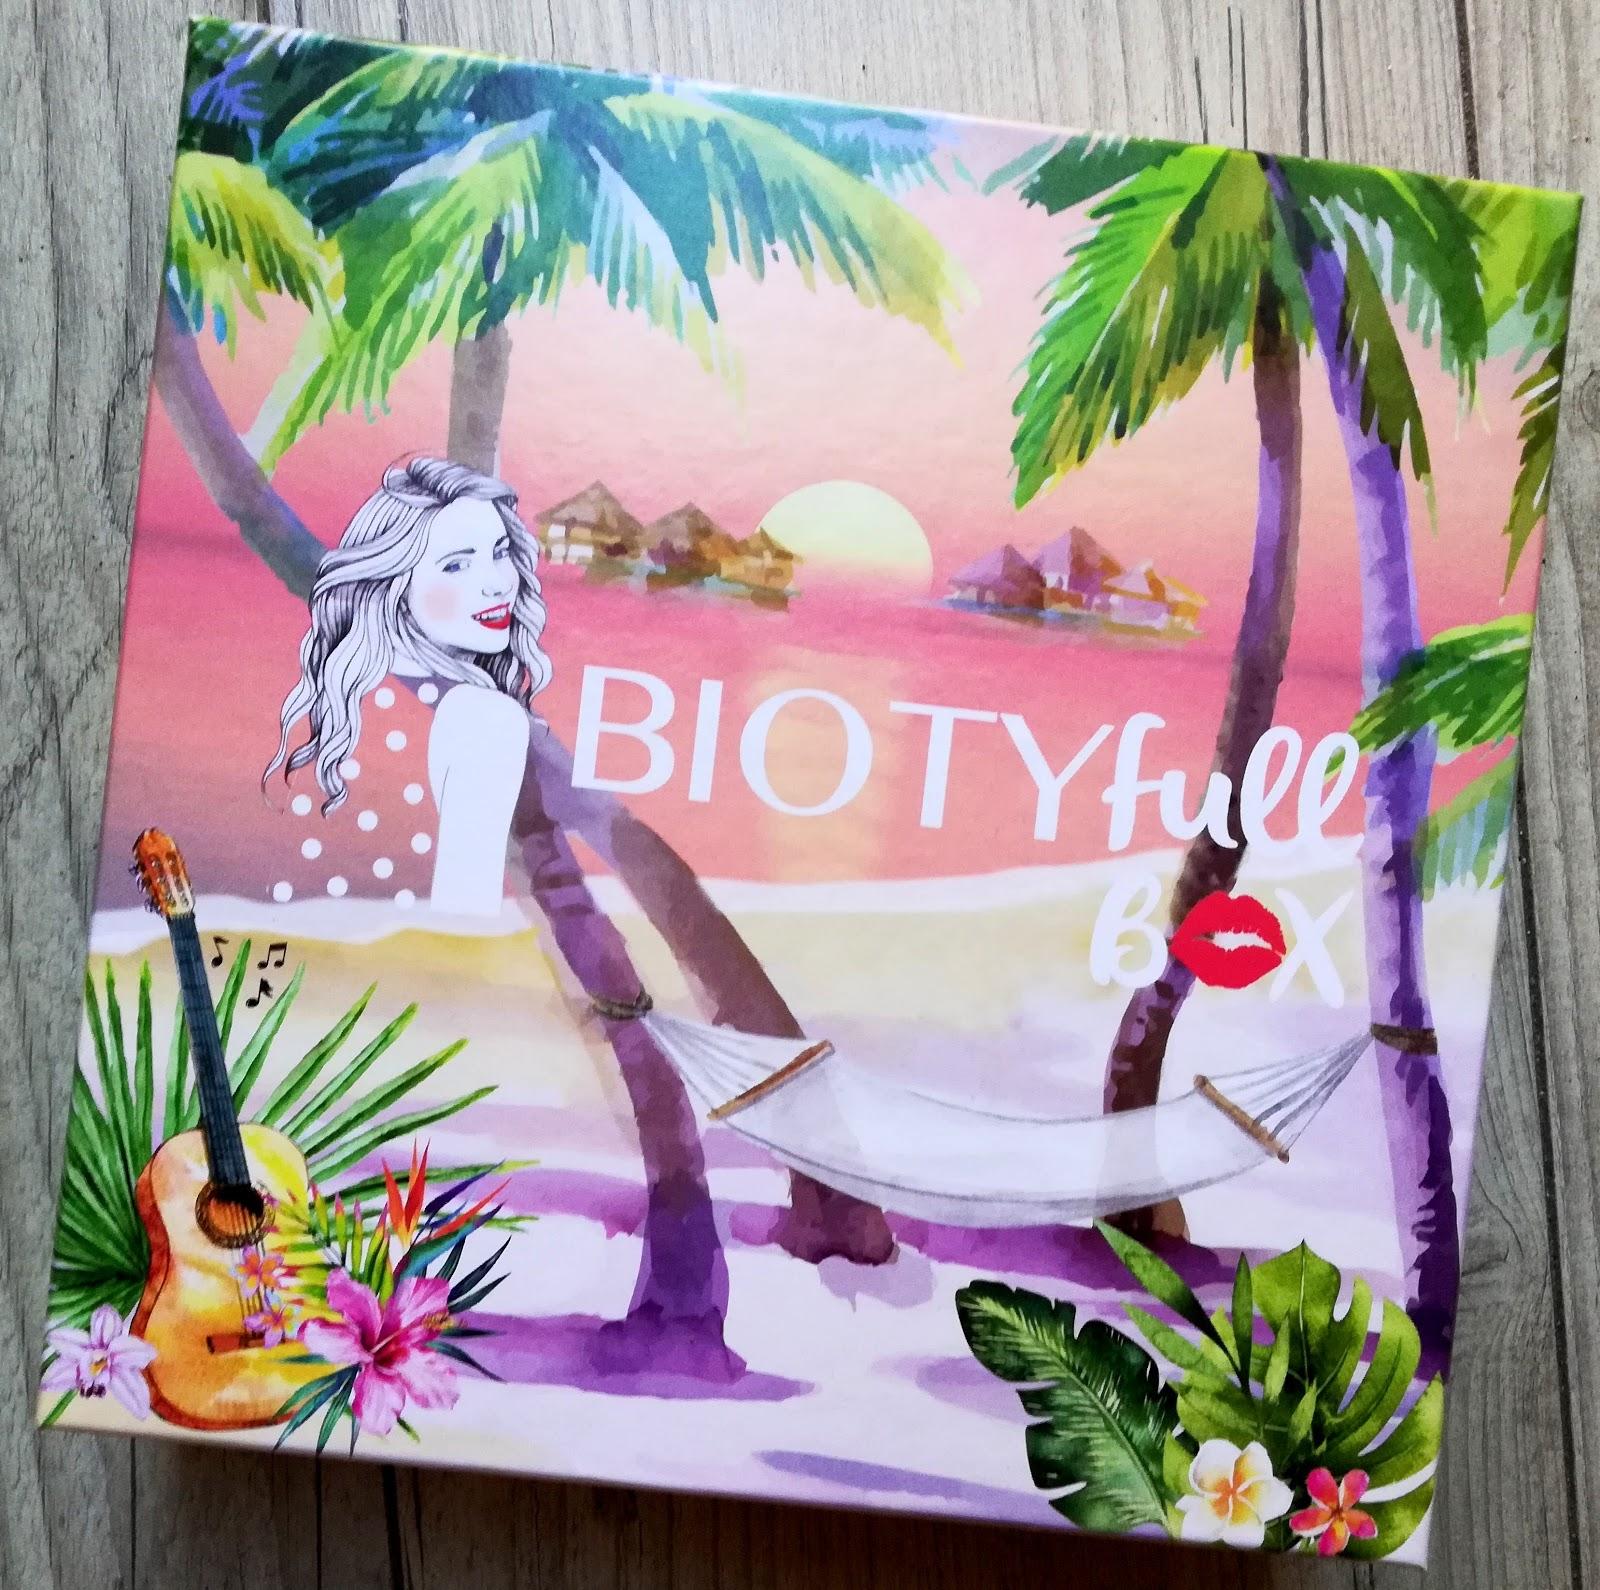 BIOTYFULL B👄X Juin 2019 : L'Estivale ! ☀🕶🌴